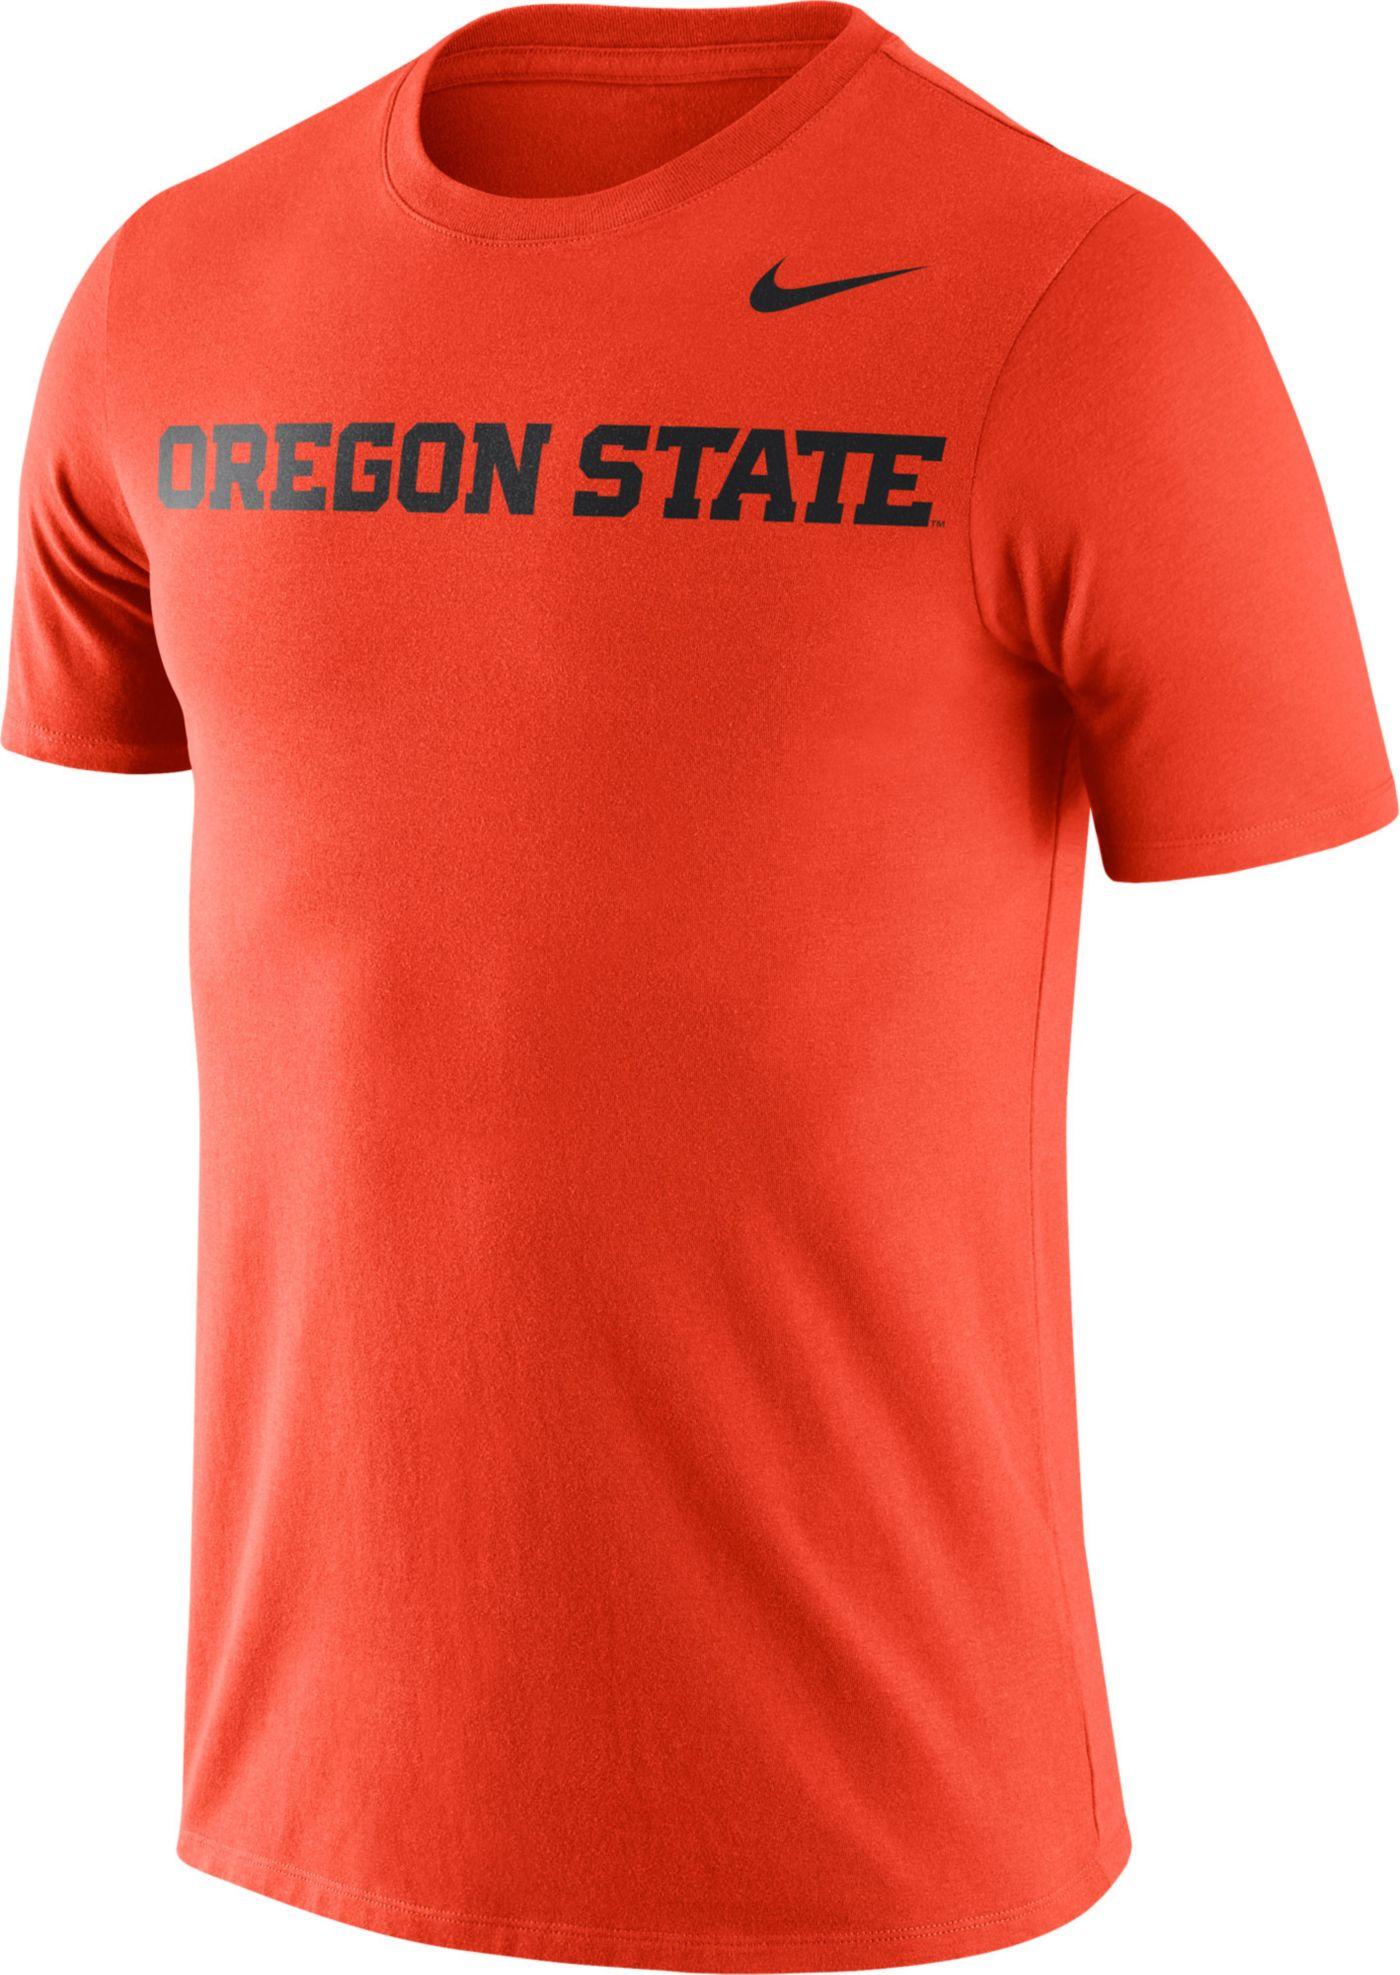 Nike Men's Oregon State Beavers Orange Dri-FIT Cotton Word T-Shirt